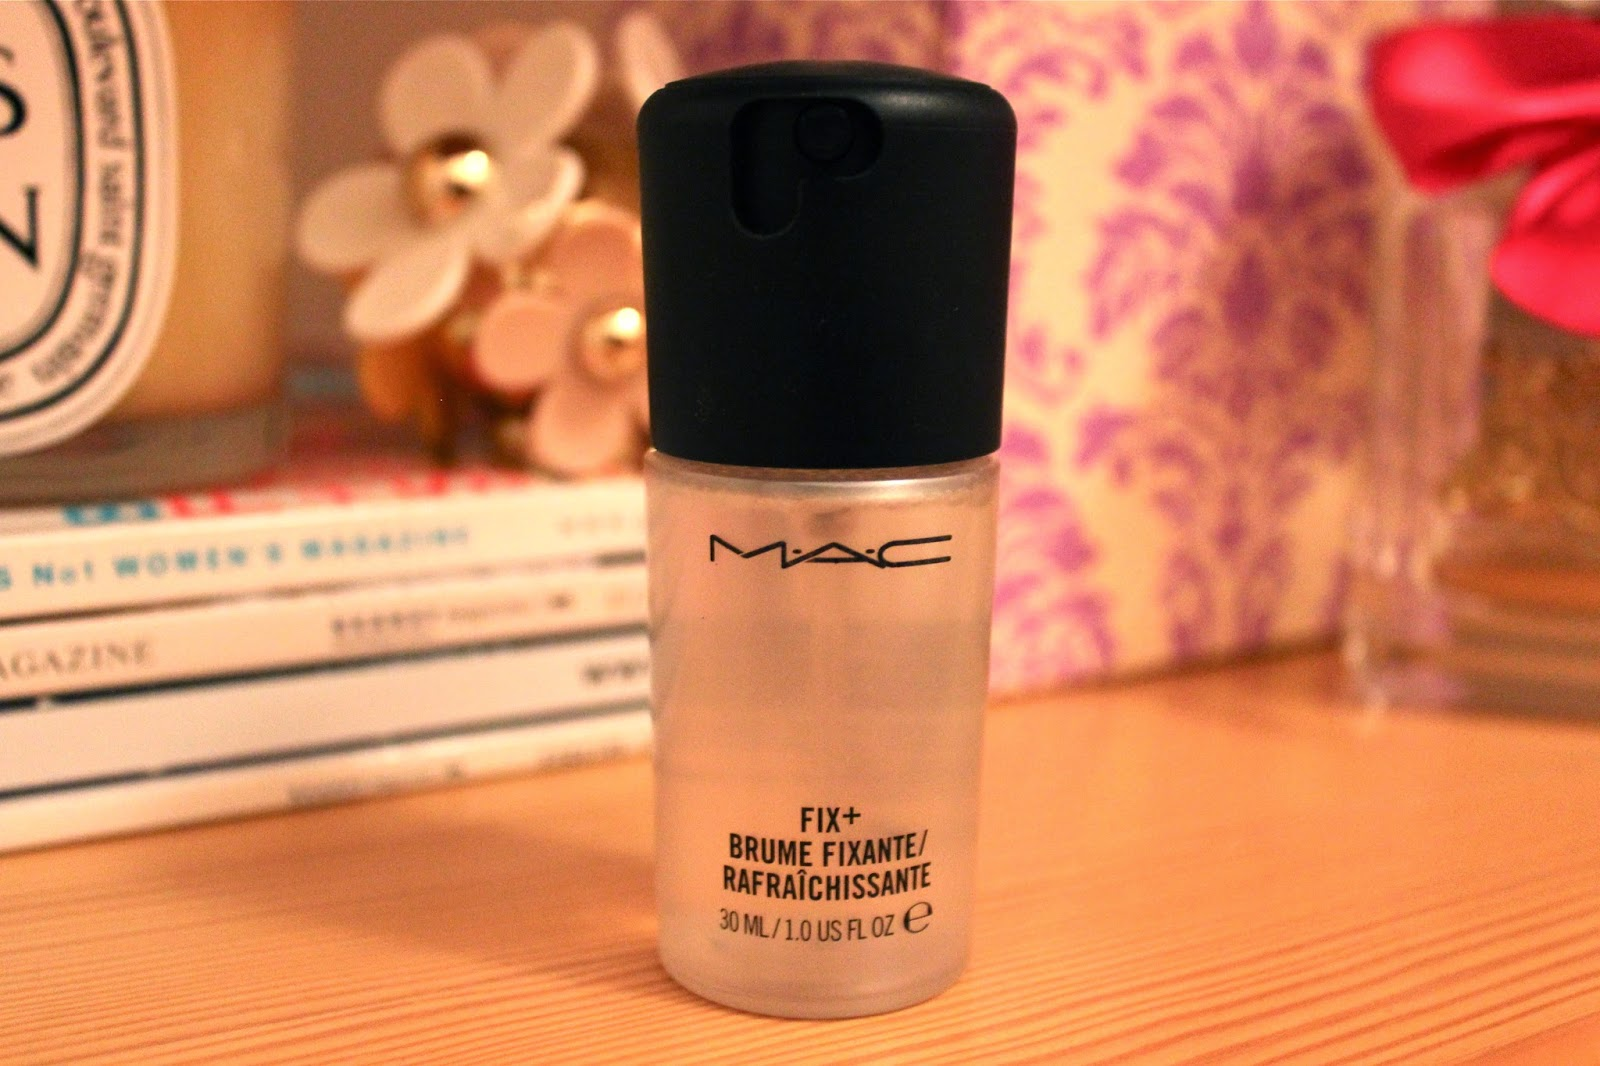 MAC Fix + Spray plus review girl culture